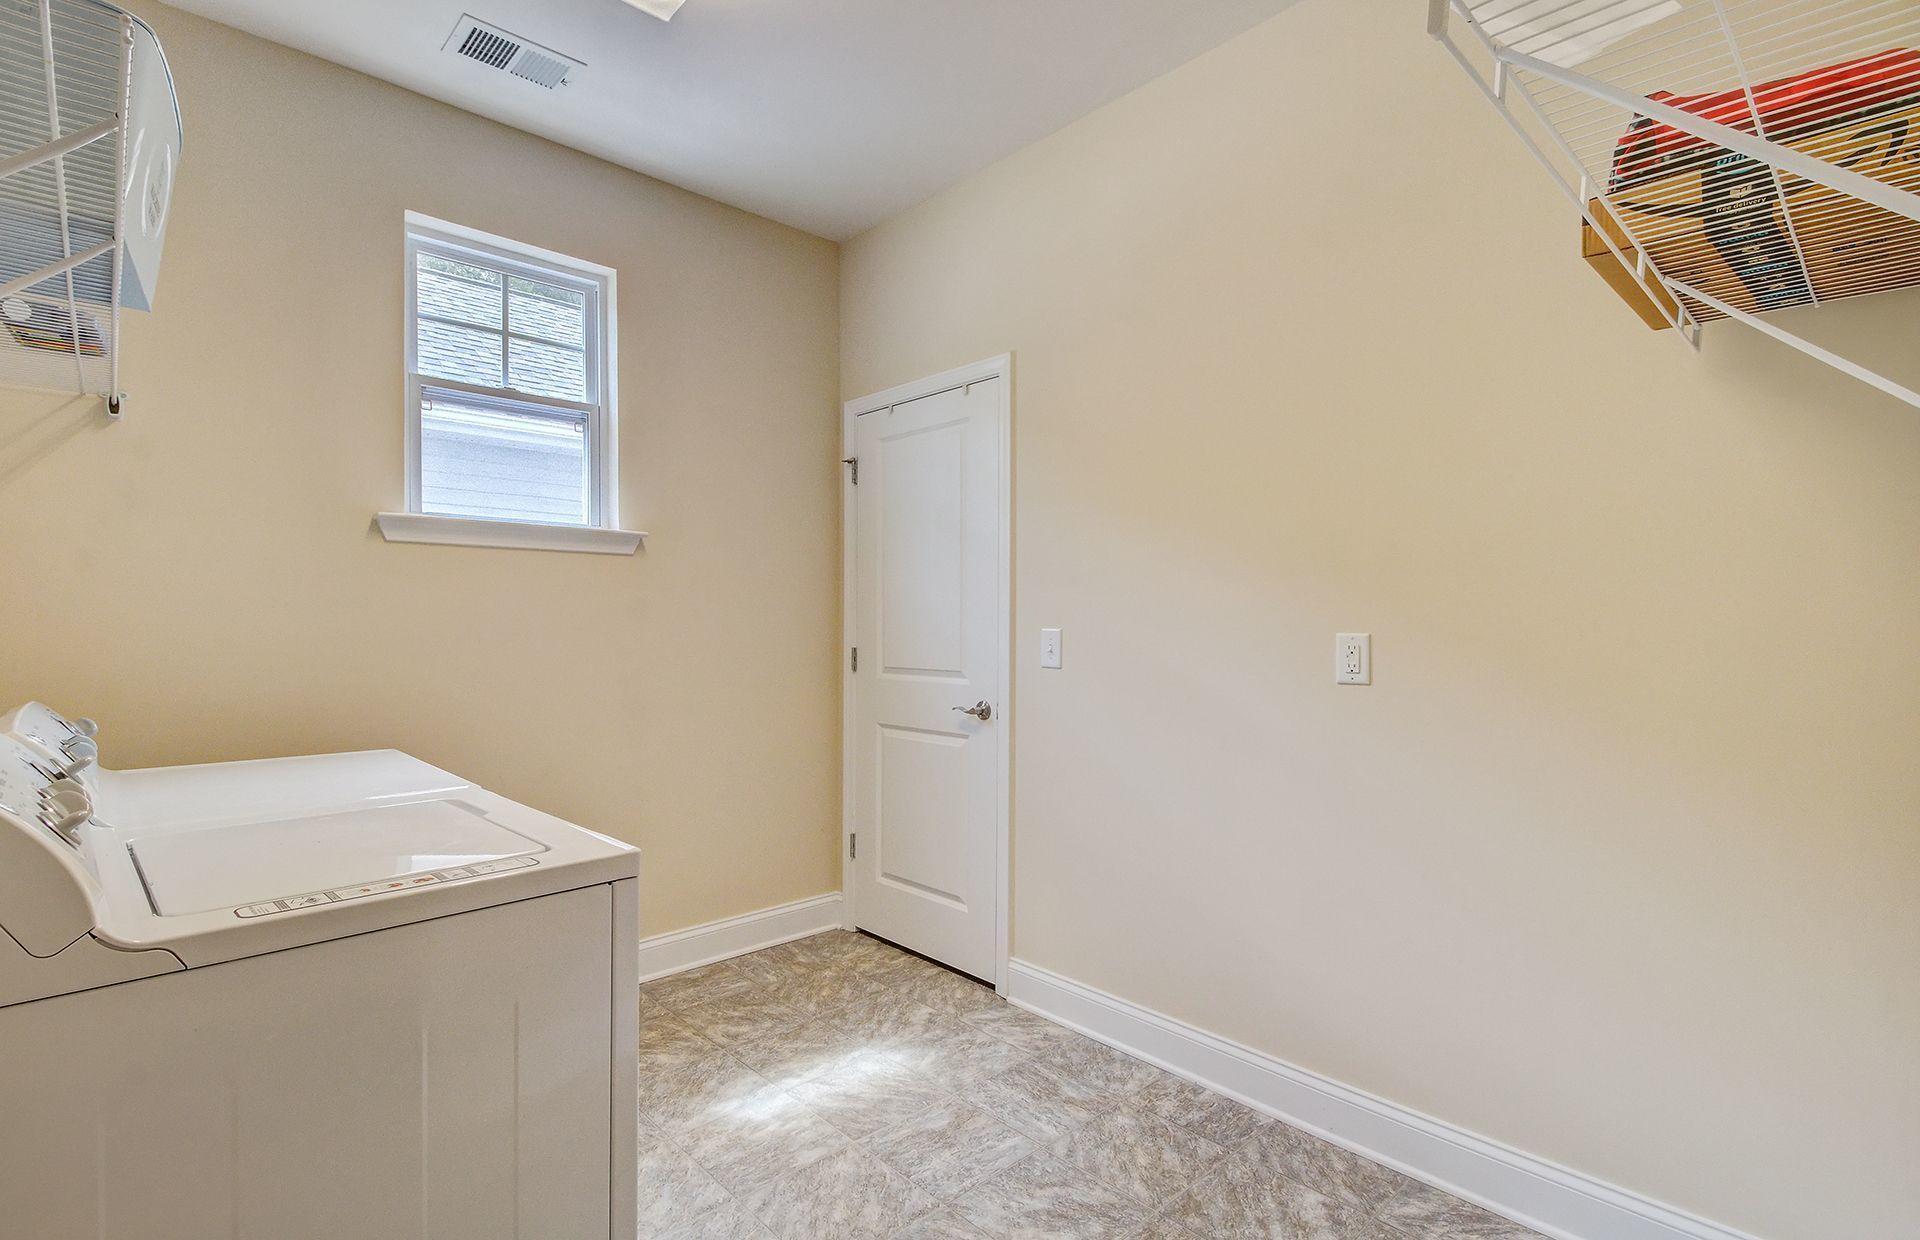 Linnen Place Homes For Sale - 1275 Shingleback, Mount Pleasant, SC - 18